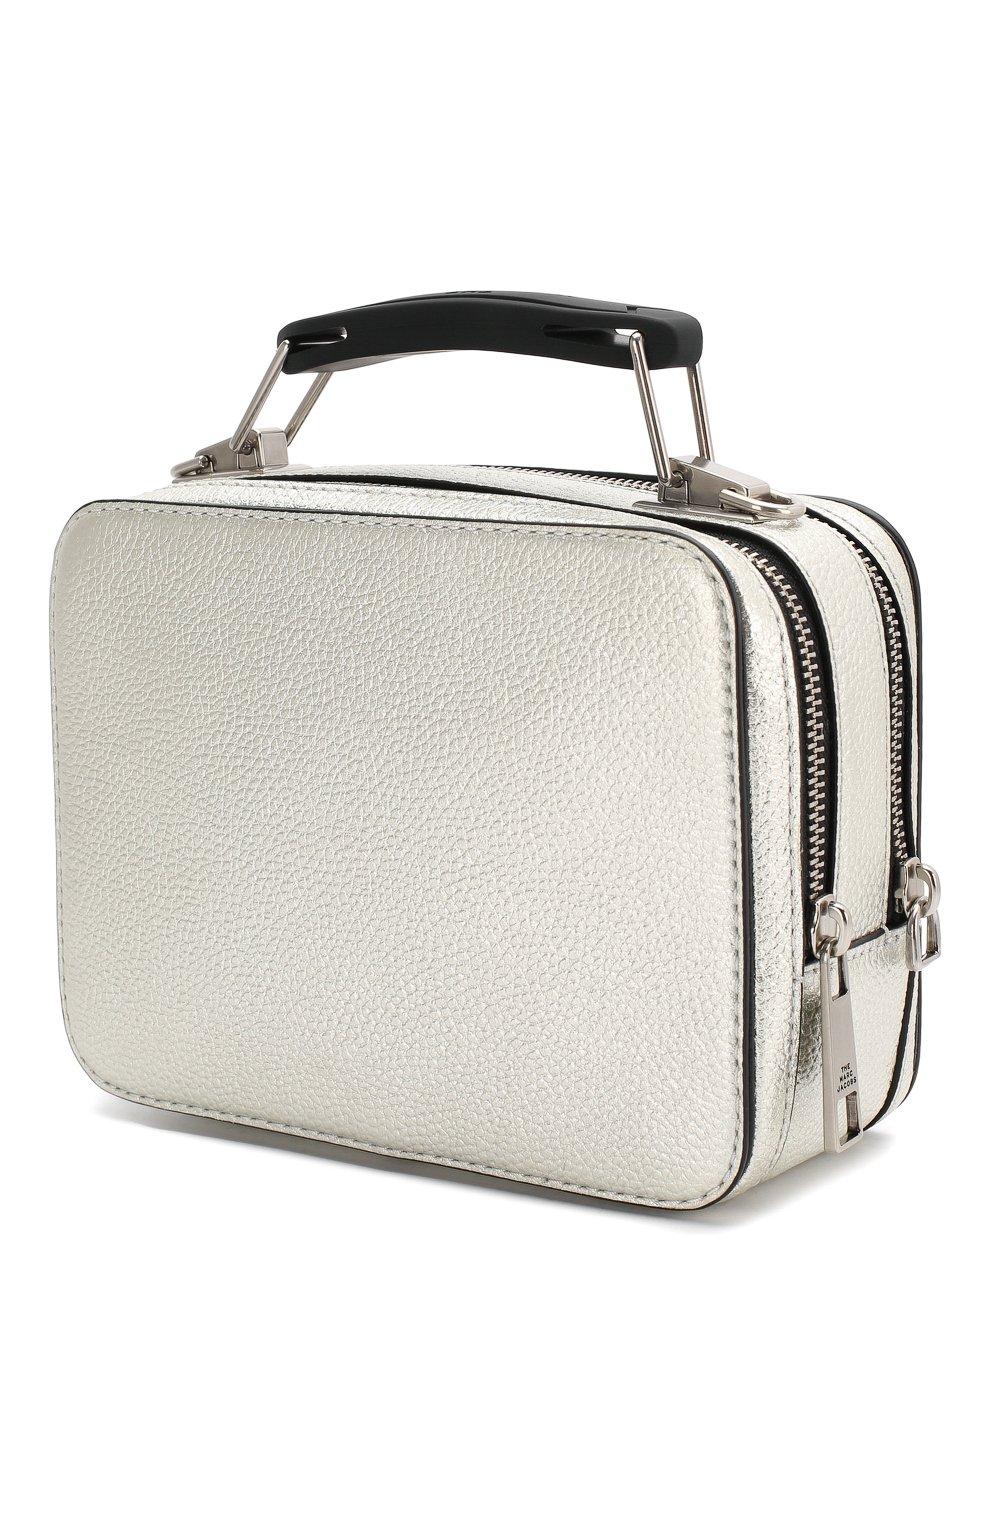 Женская сумка the box 20 MARC JACOBS (THE) серебряного цвета, арт. M0016183 | Фото 3